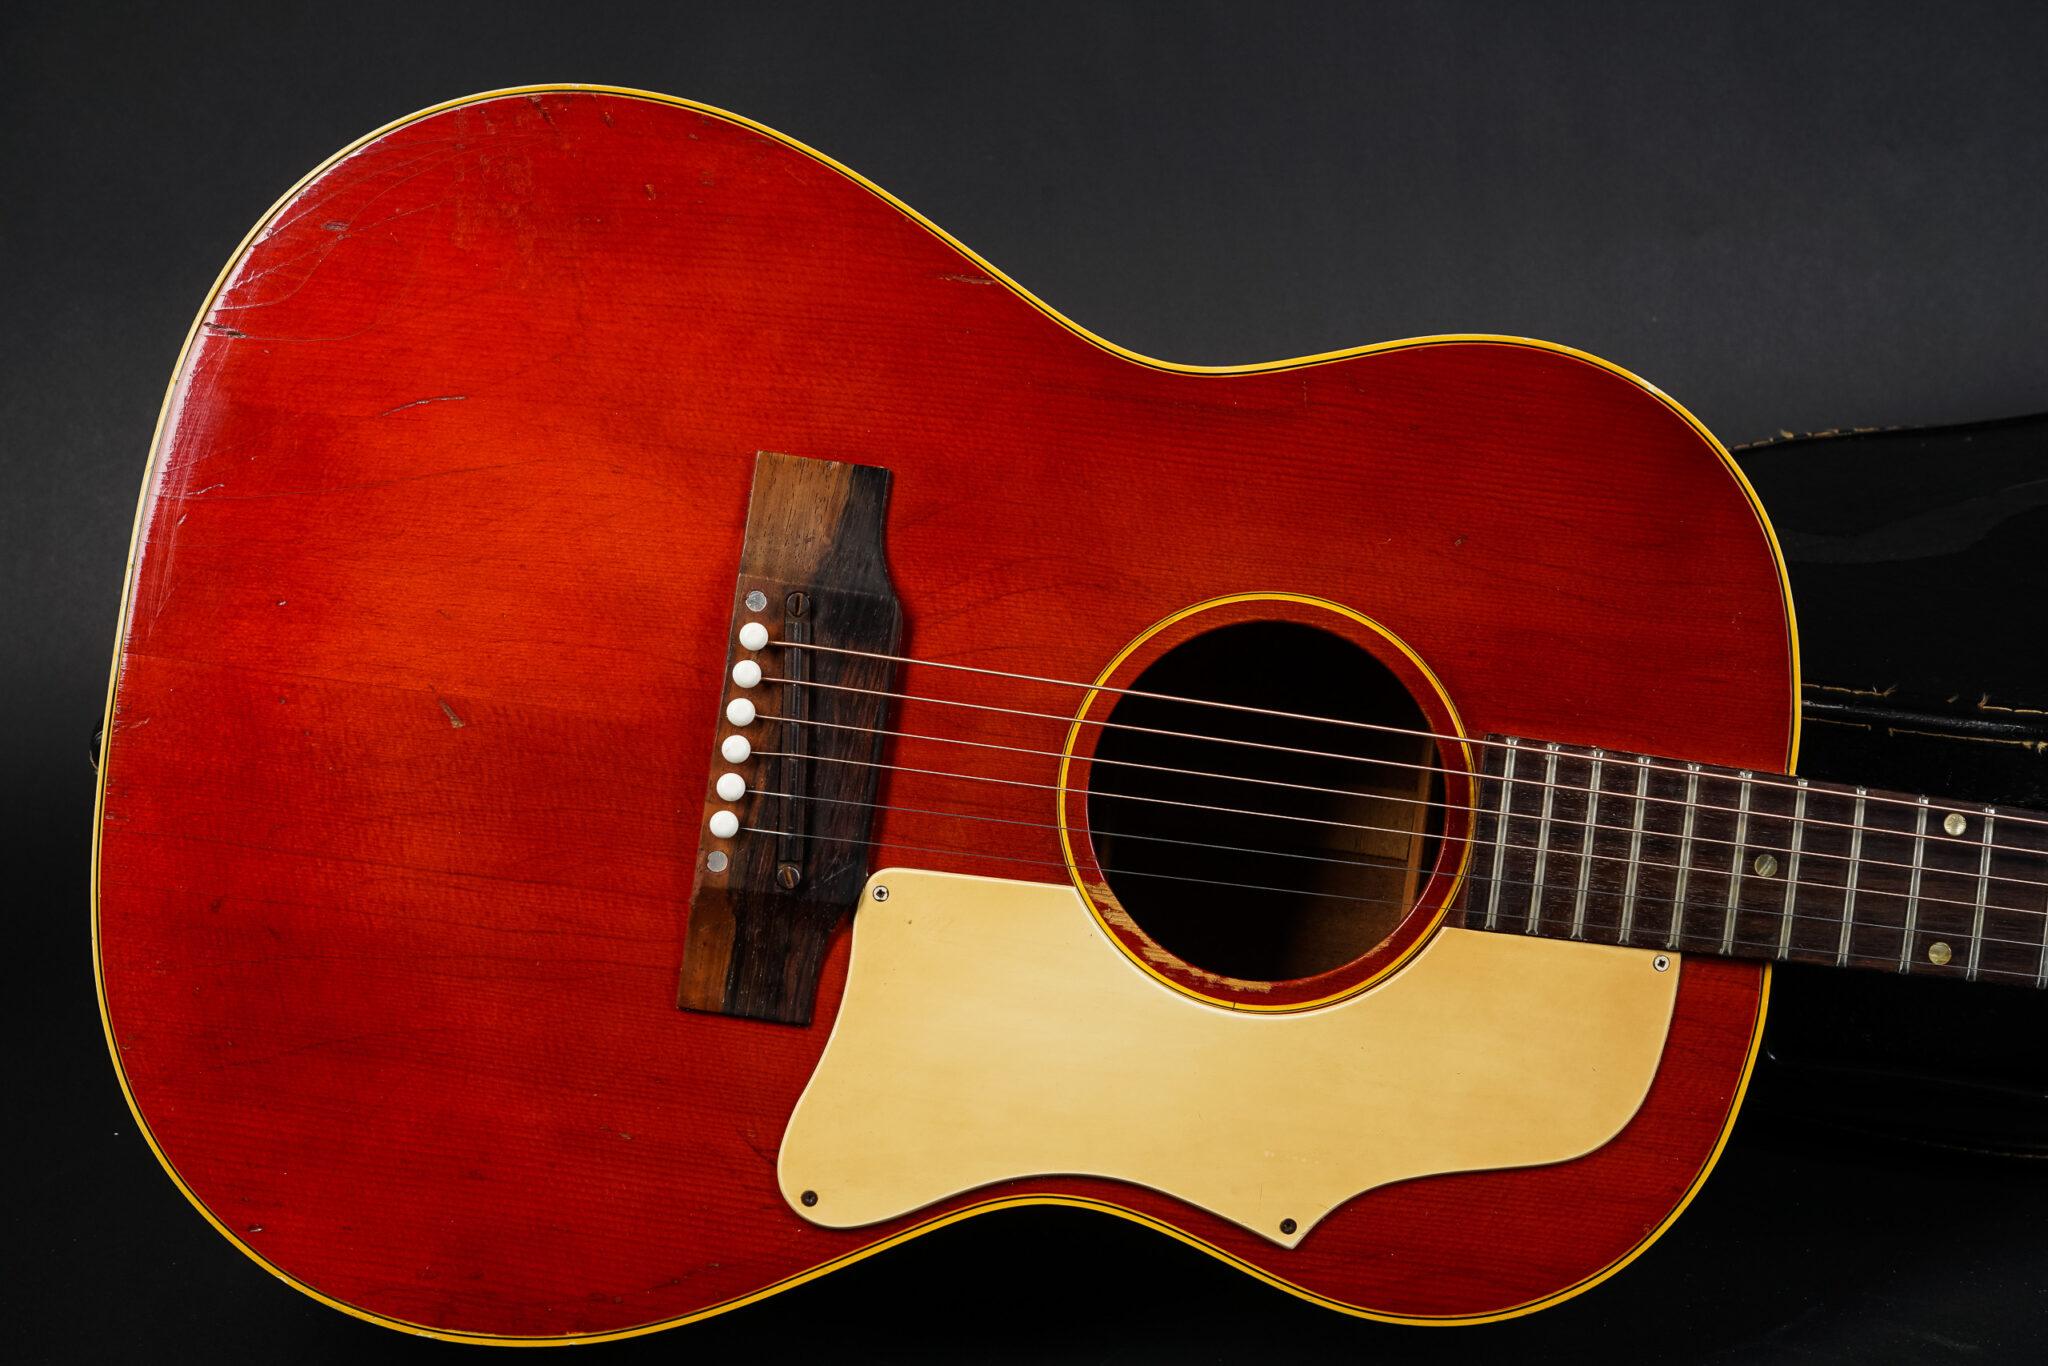 https://guitarpoint.de/app/uploads/products/1968-gibson-b25-cherry/1968-Gibson-B25-Cherry-500384-8-2048x1366.jpg